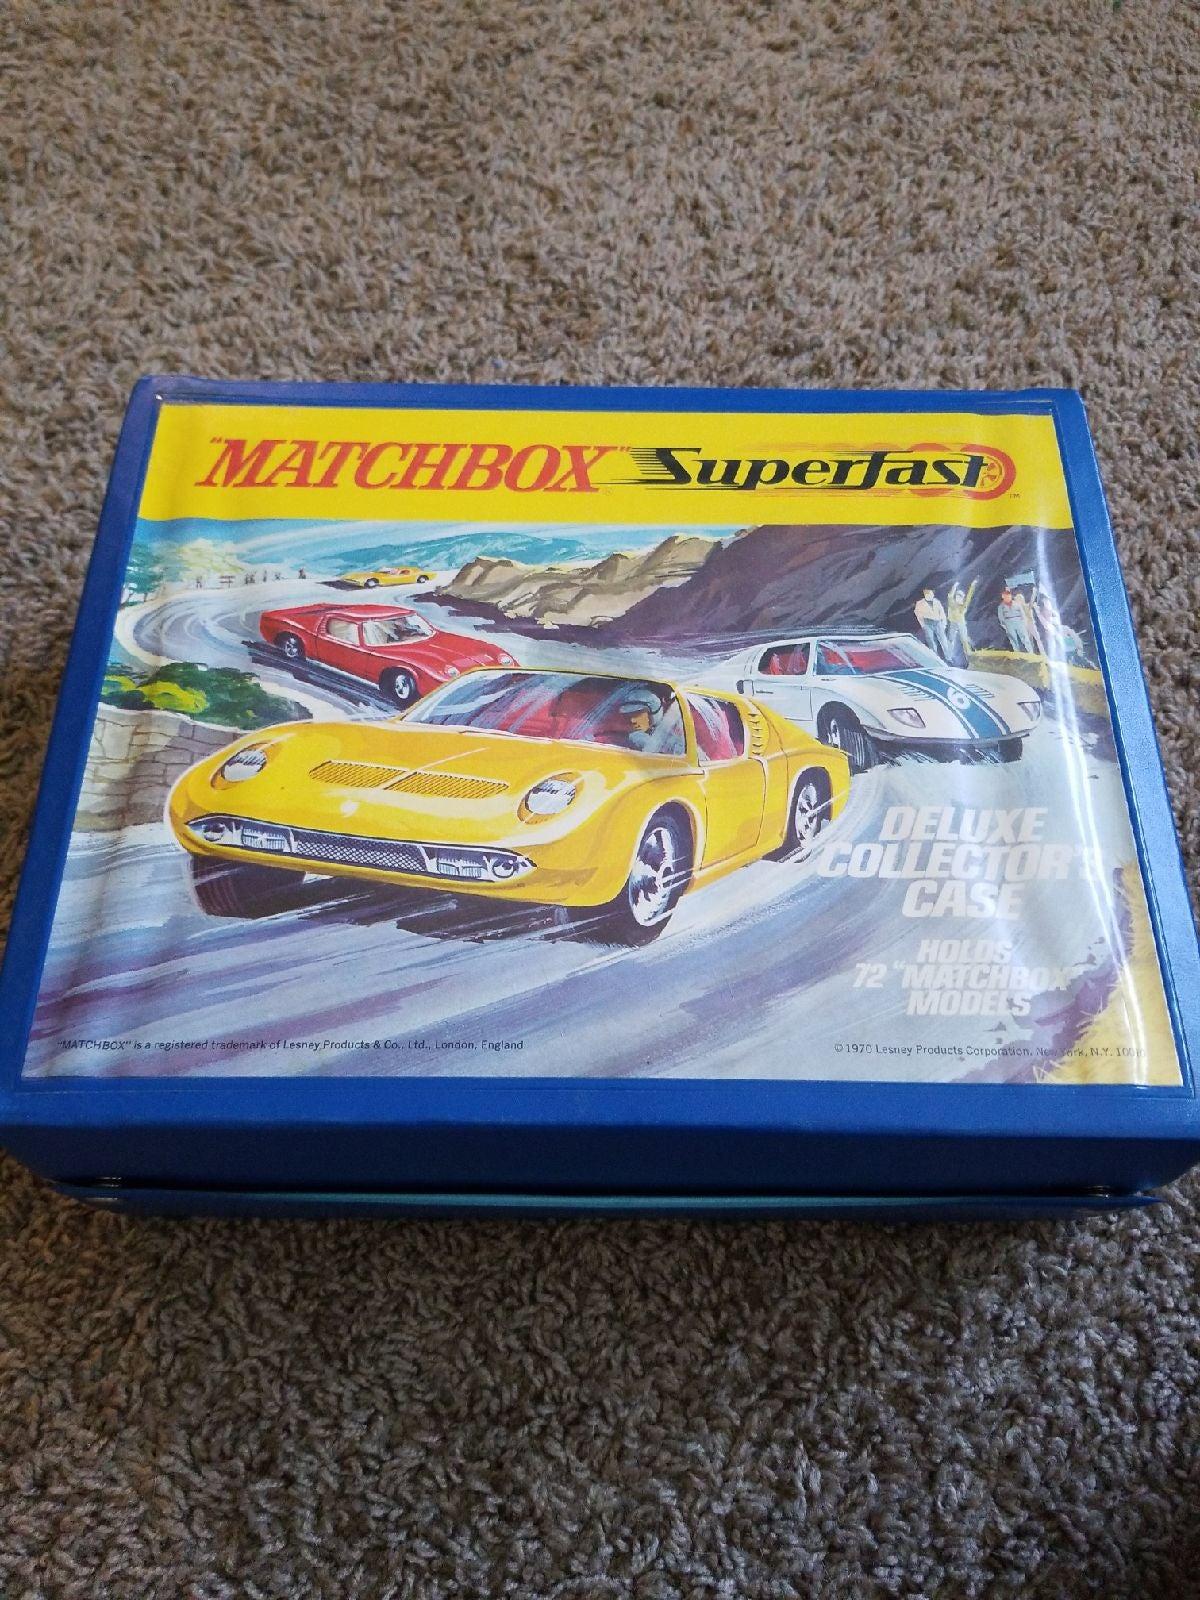 Matchbox Superfast 1970 Carring Case